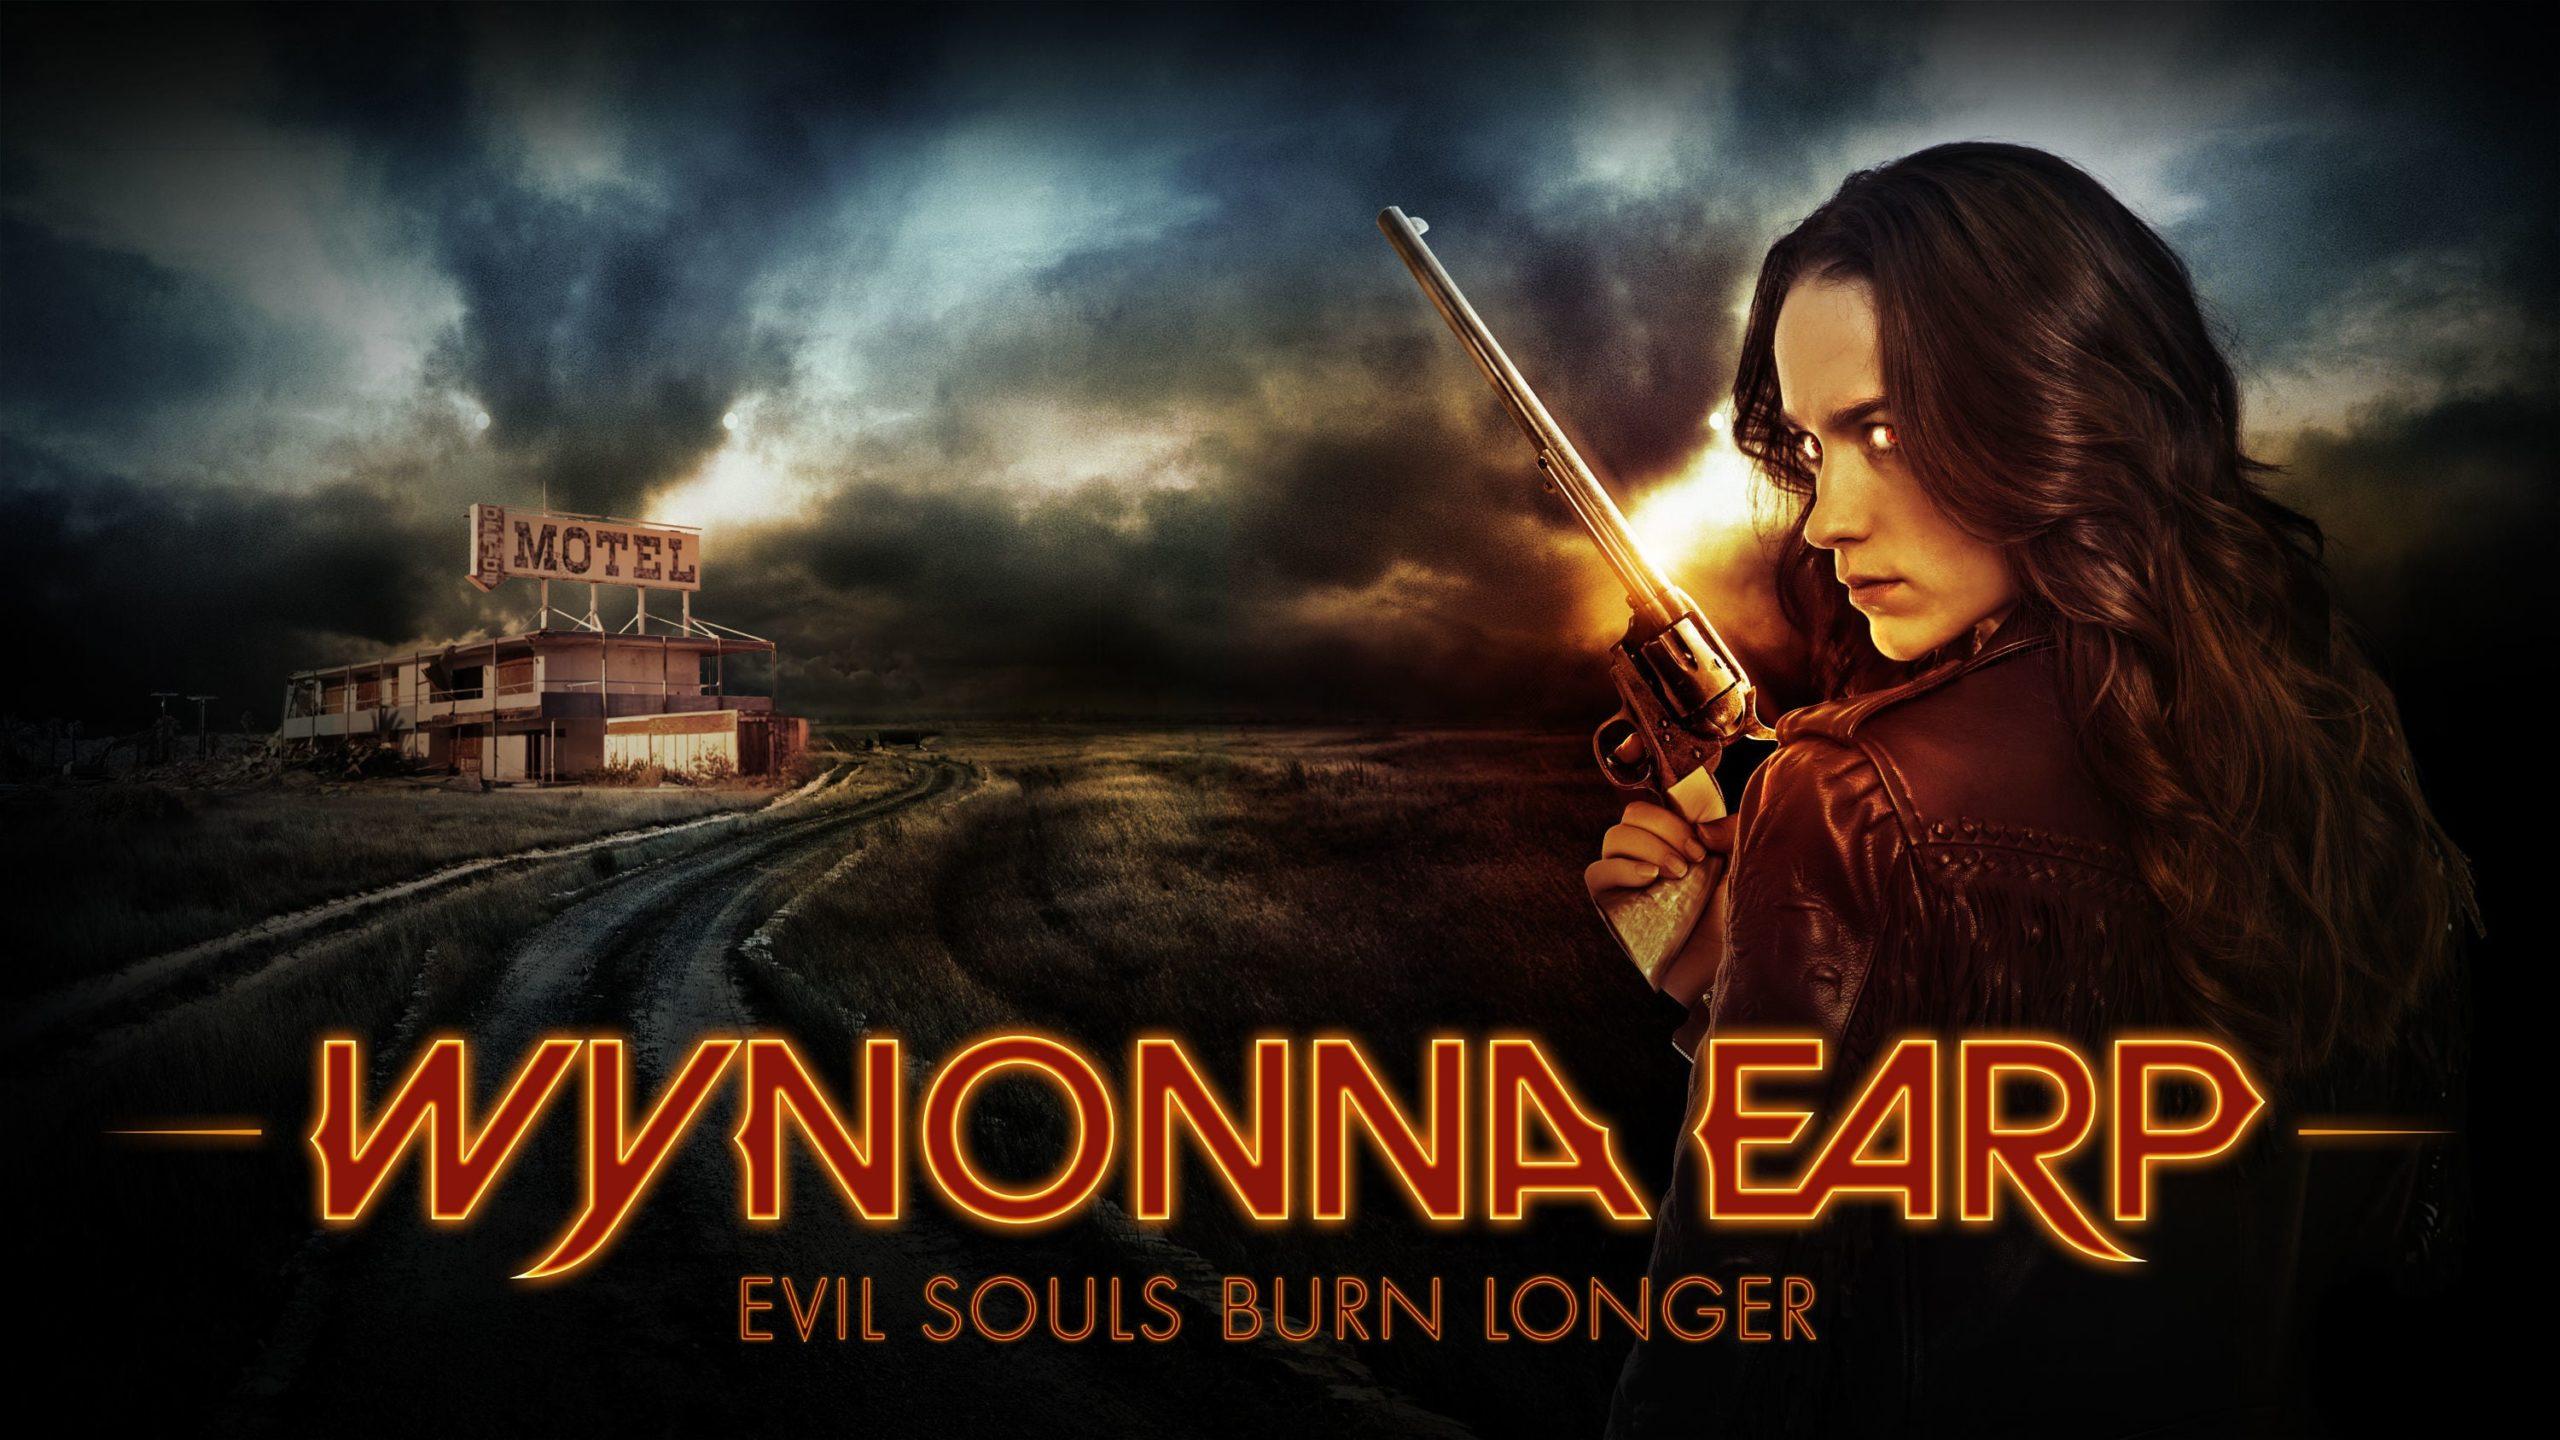 720p~ Wynonna Earp Season 4 Episode 5